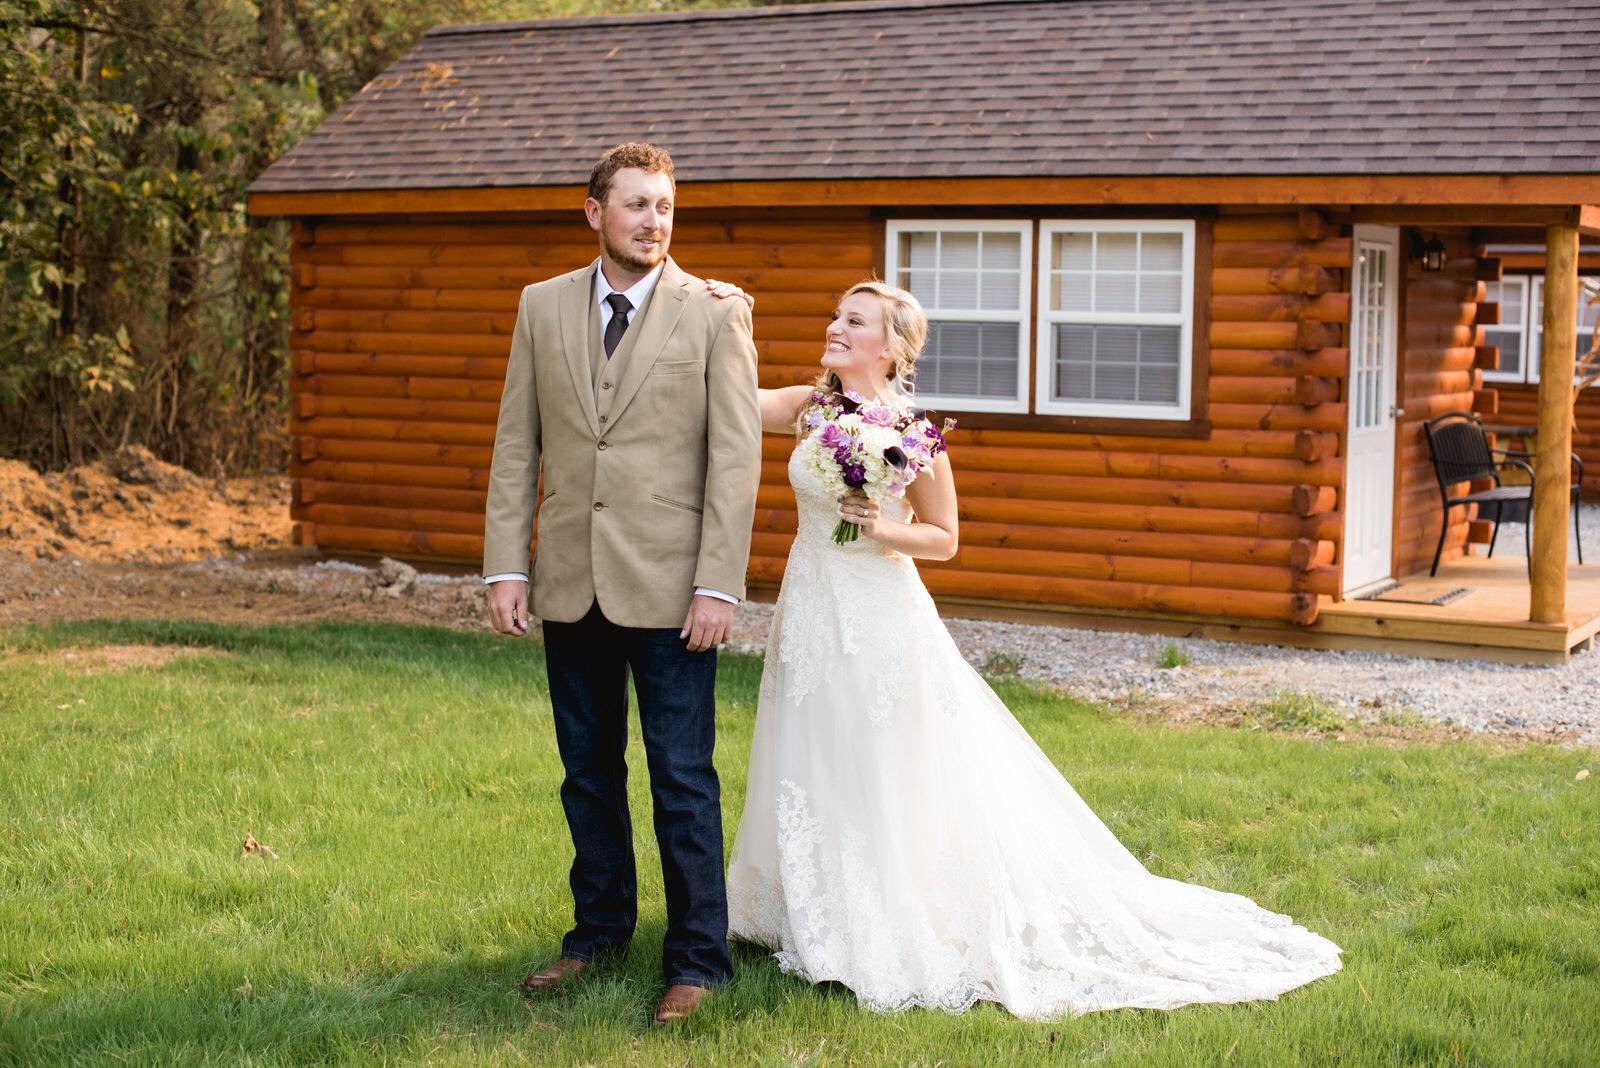 wedding_at_red_fox_winery_wedding_photographer059.jpg